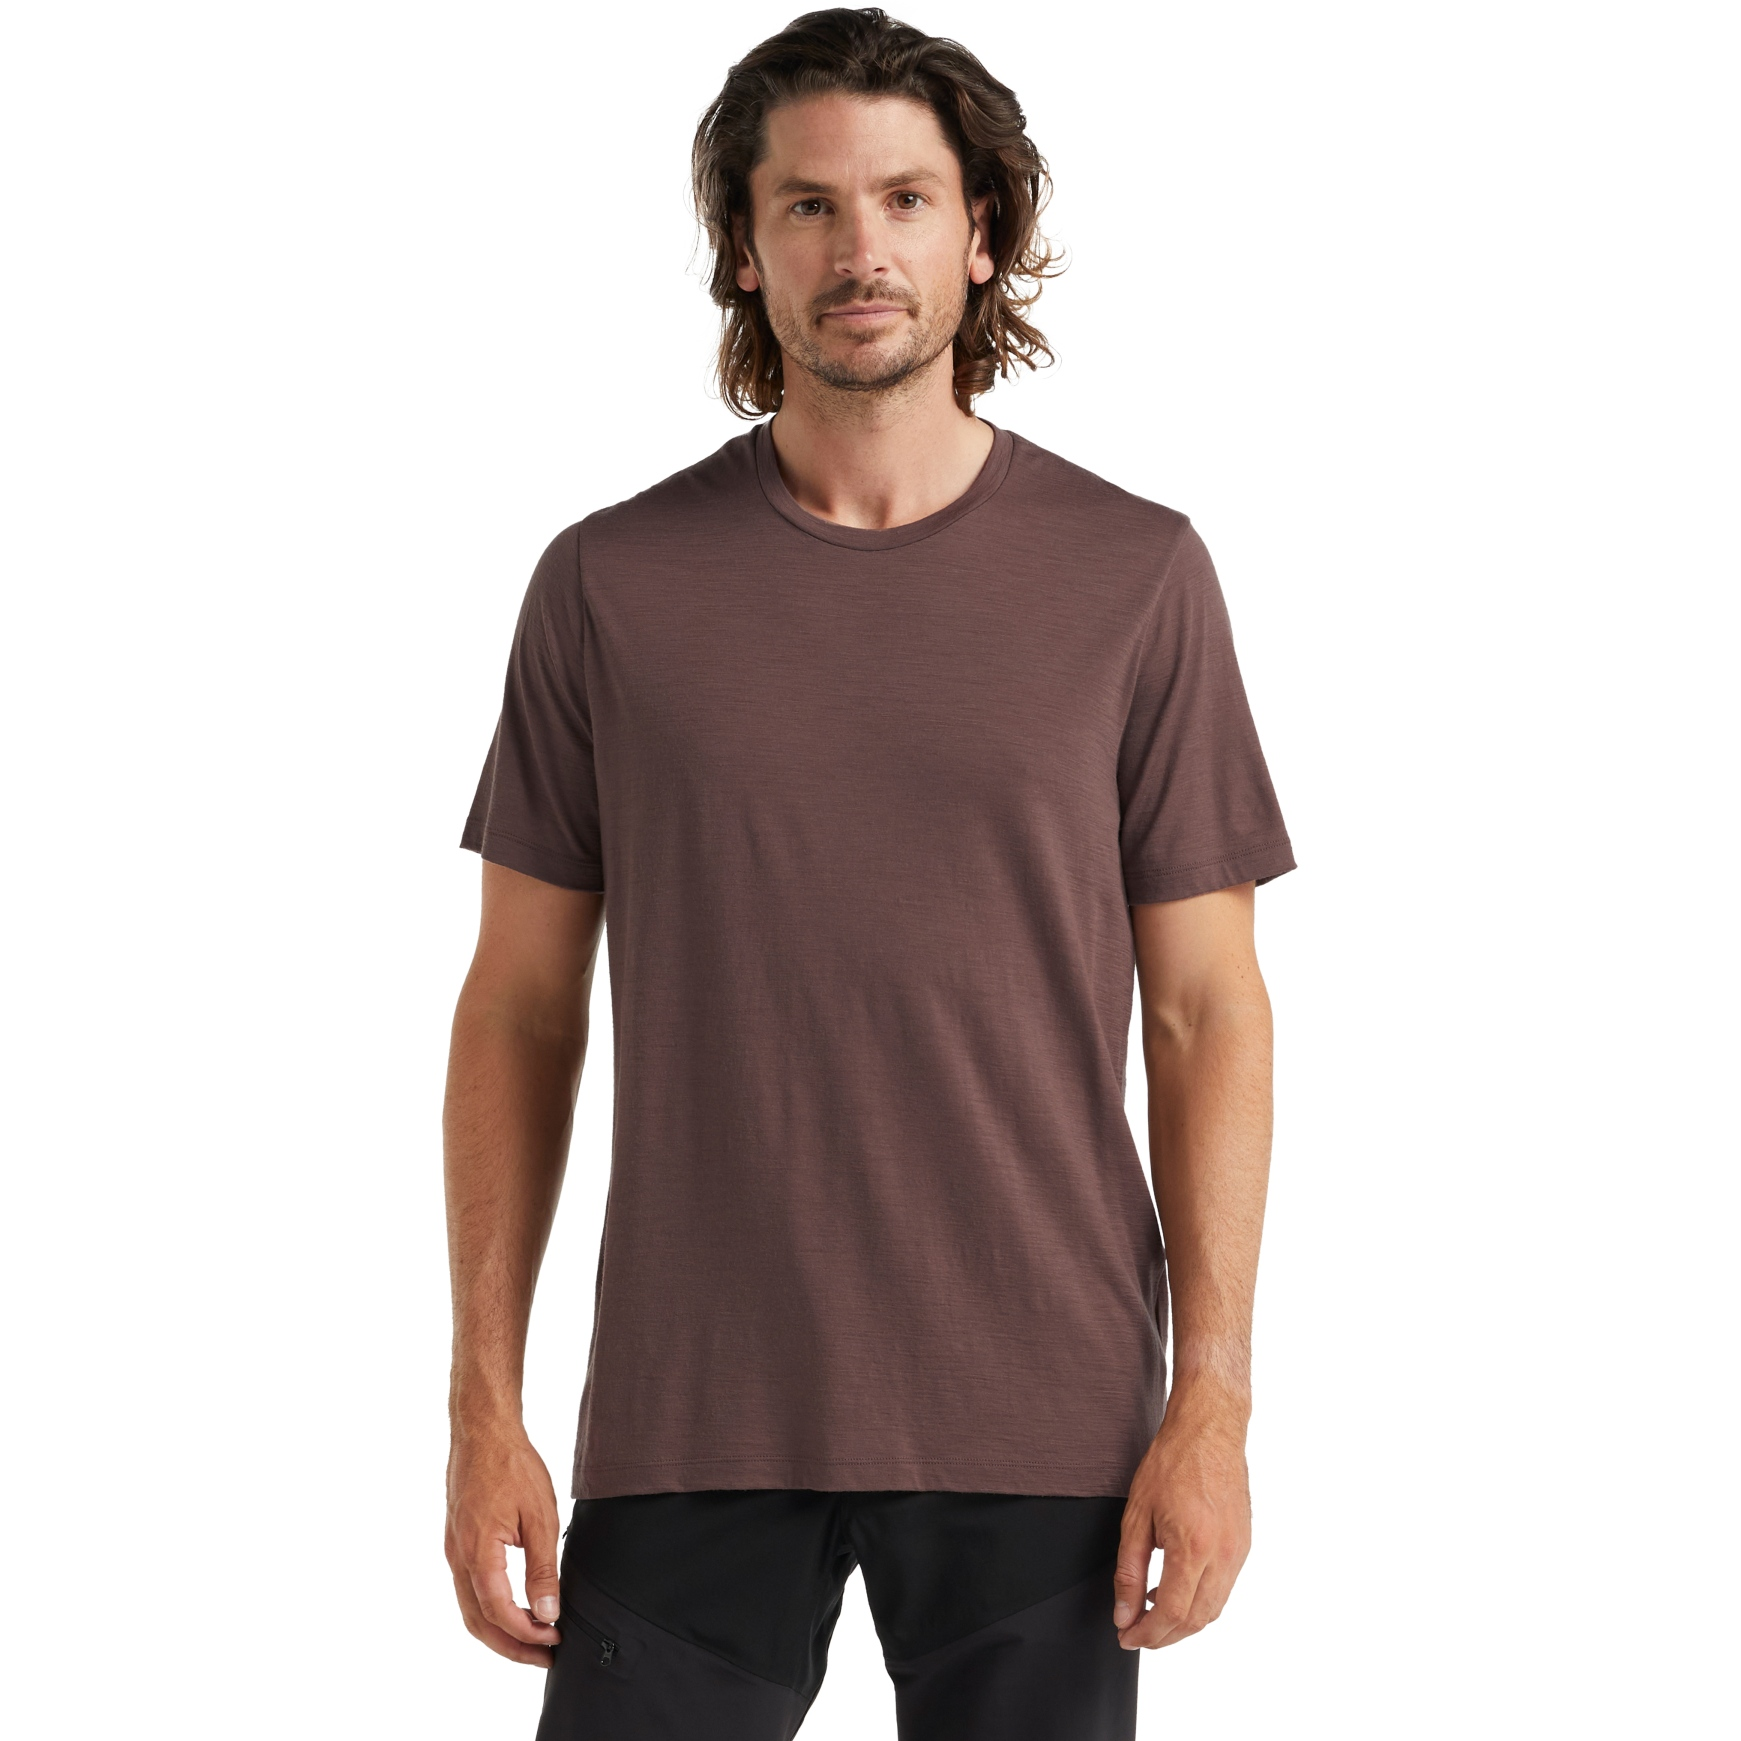 Bild von Icebreaker Tech Lite II Herren T-Shirt - Mink